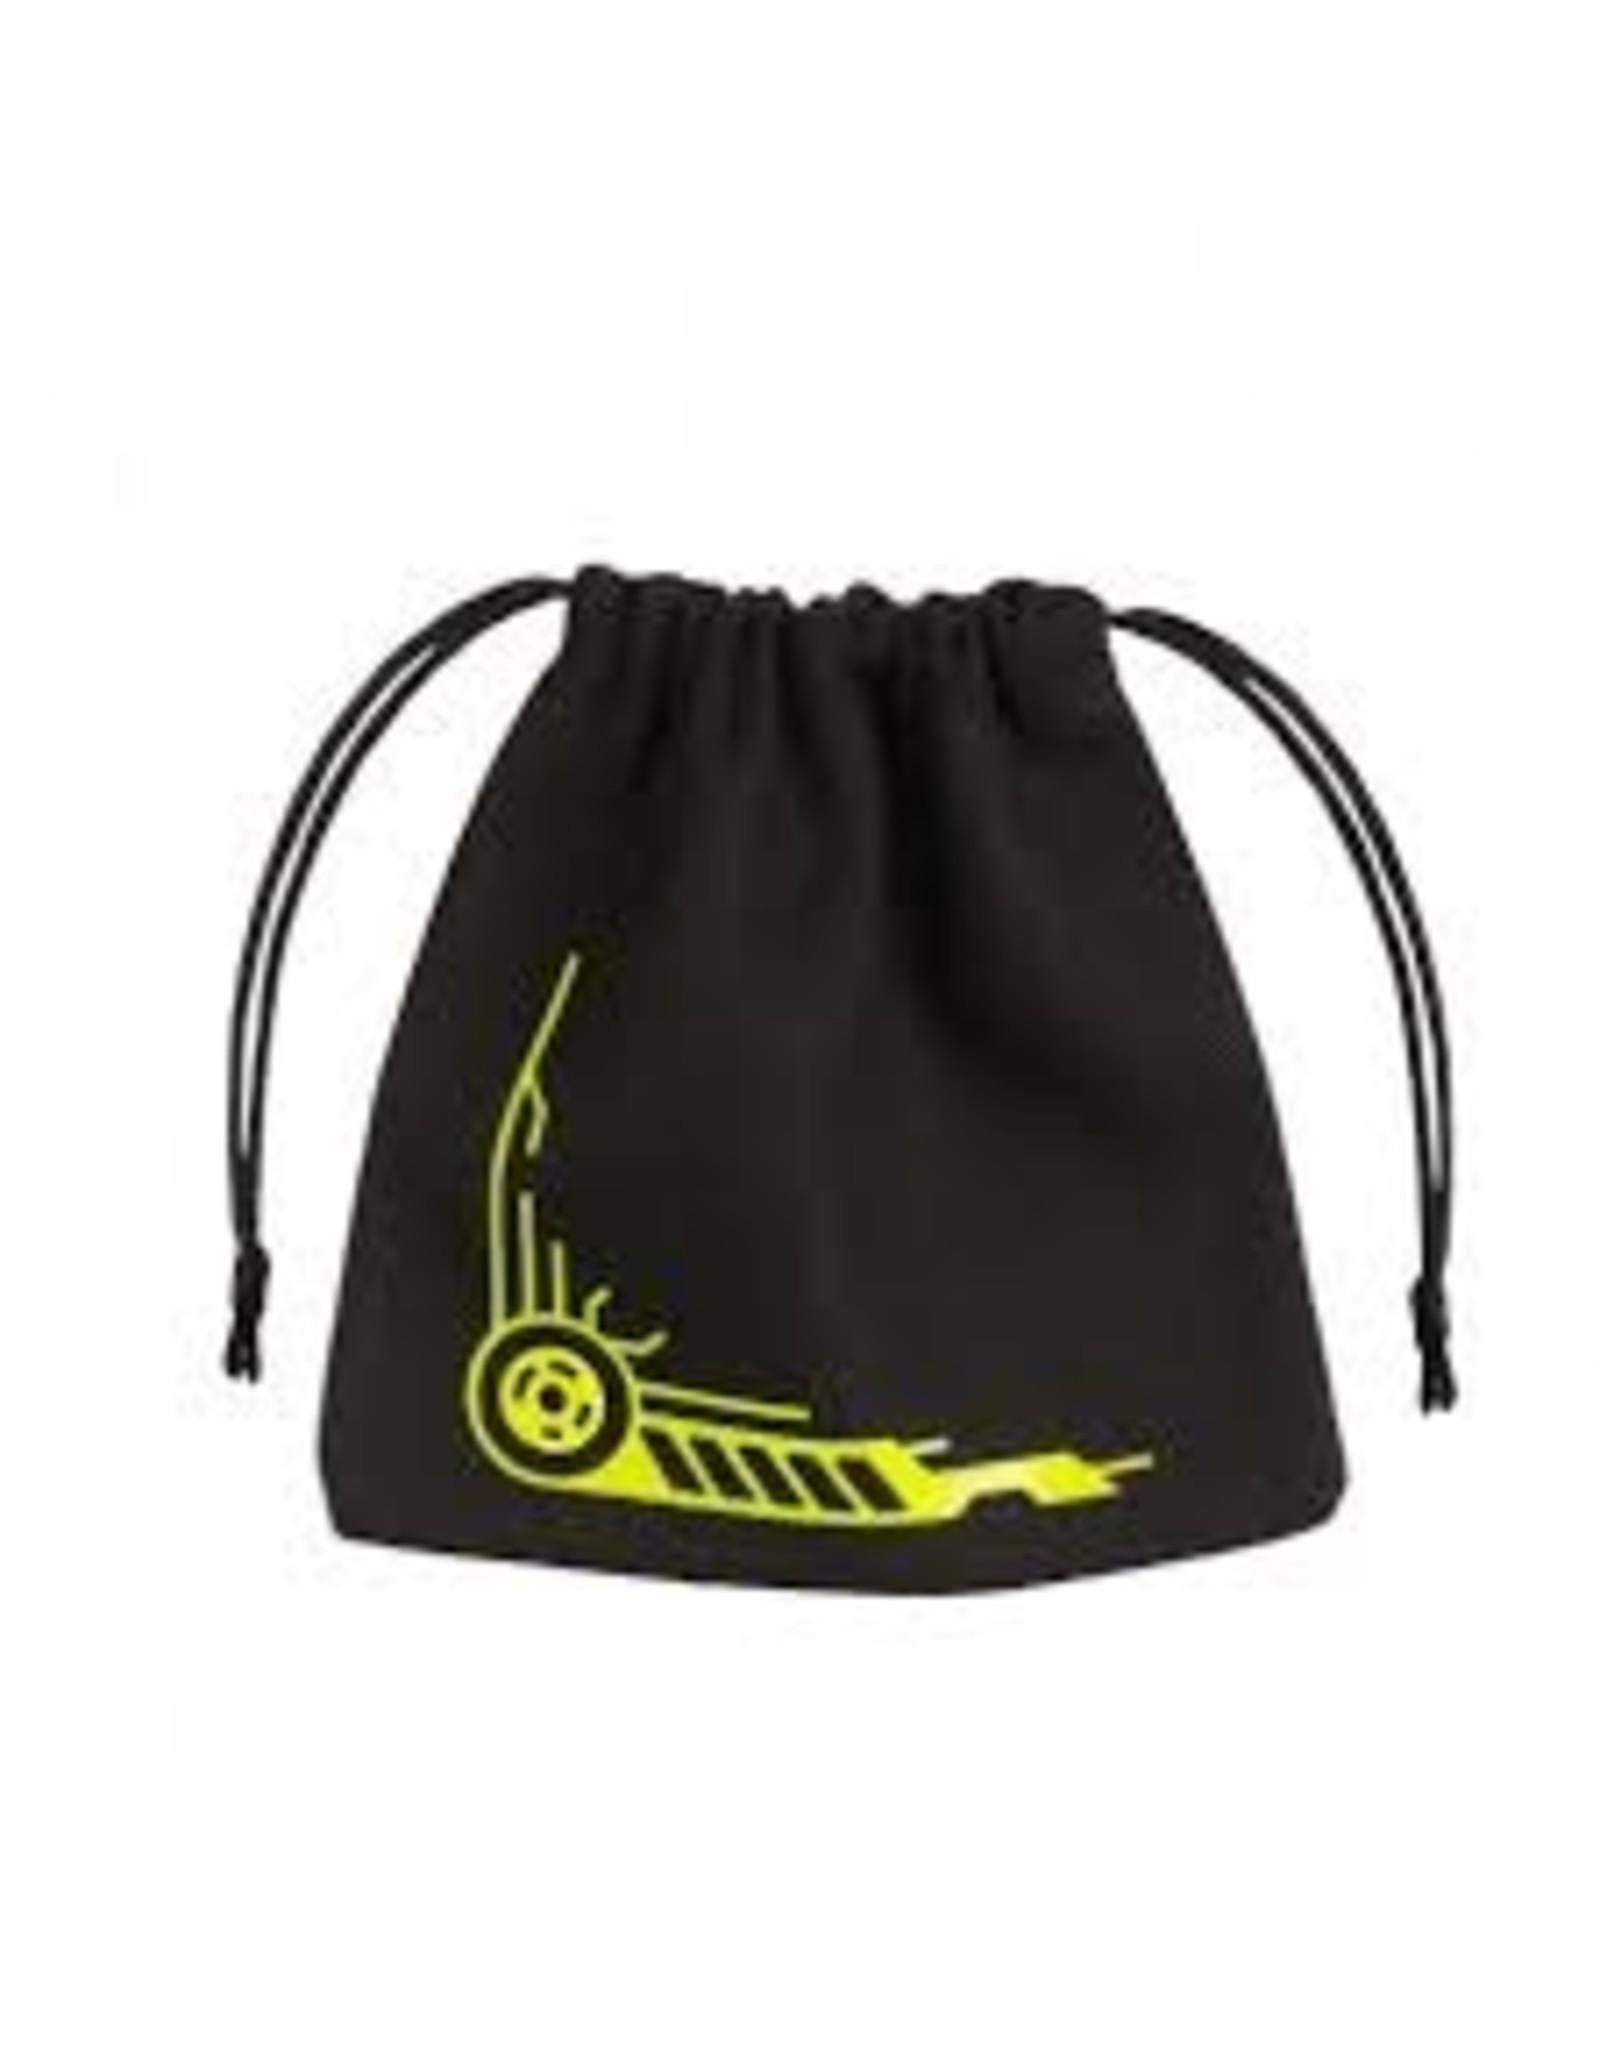 Dice Color Galactic: BKye Bag